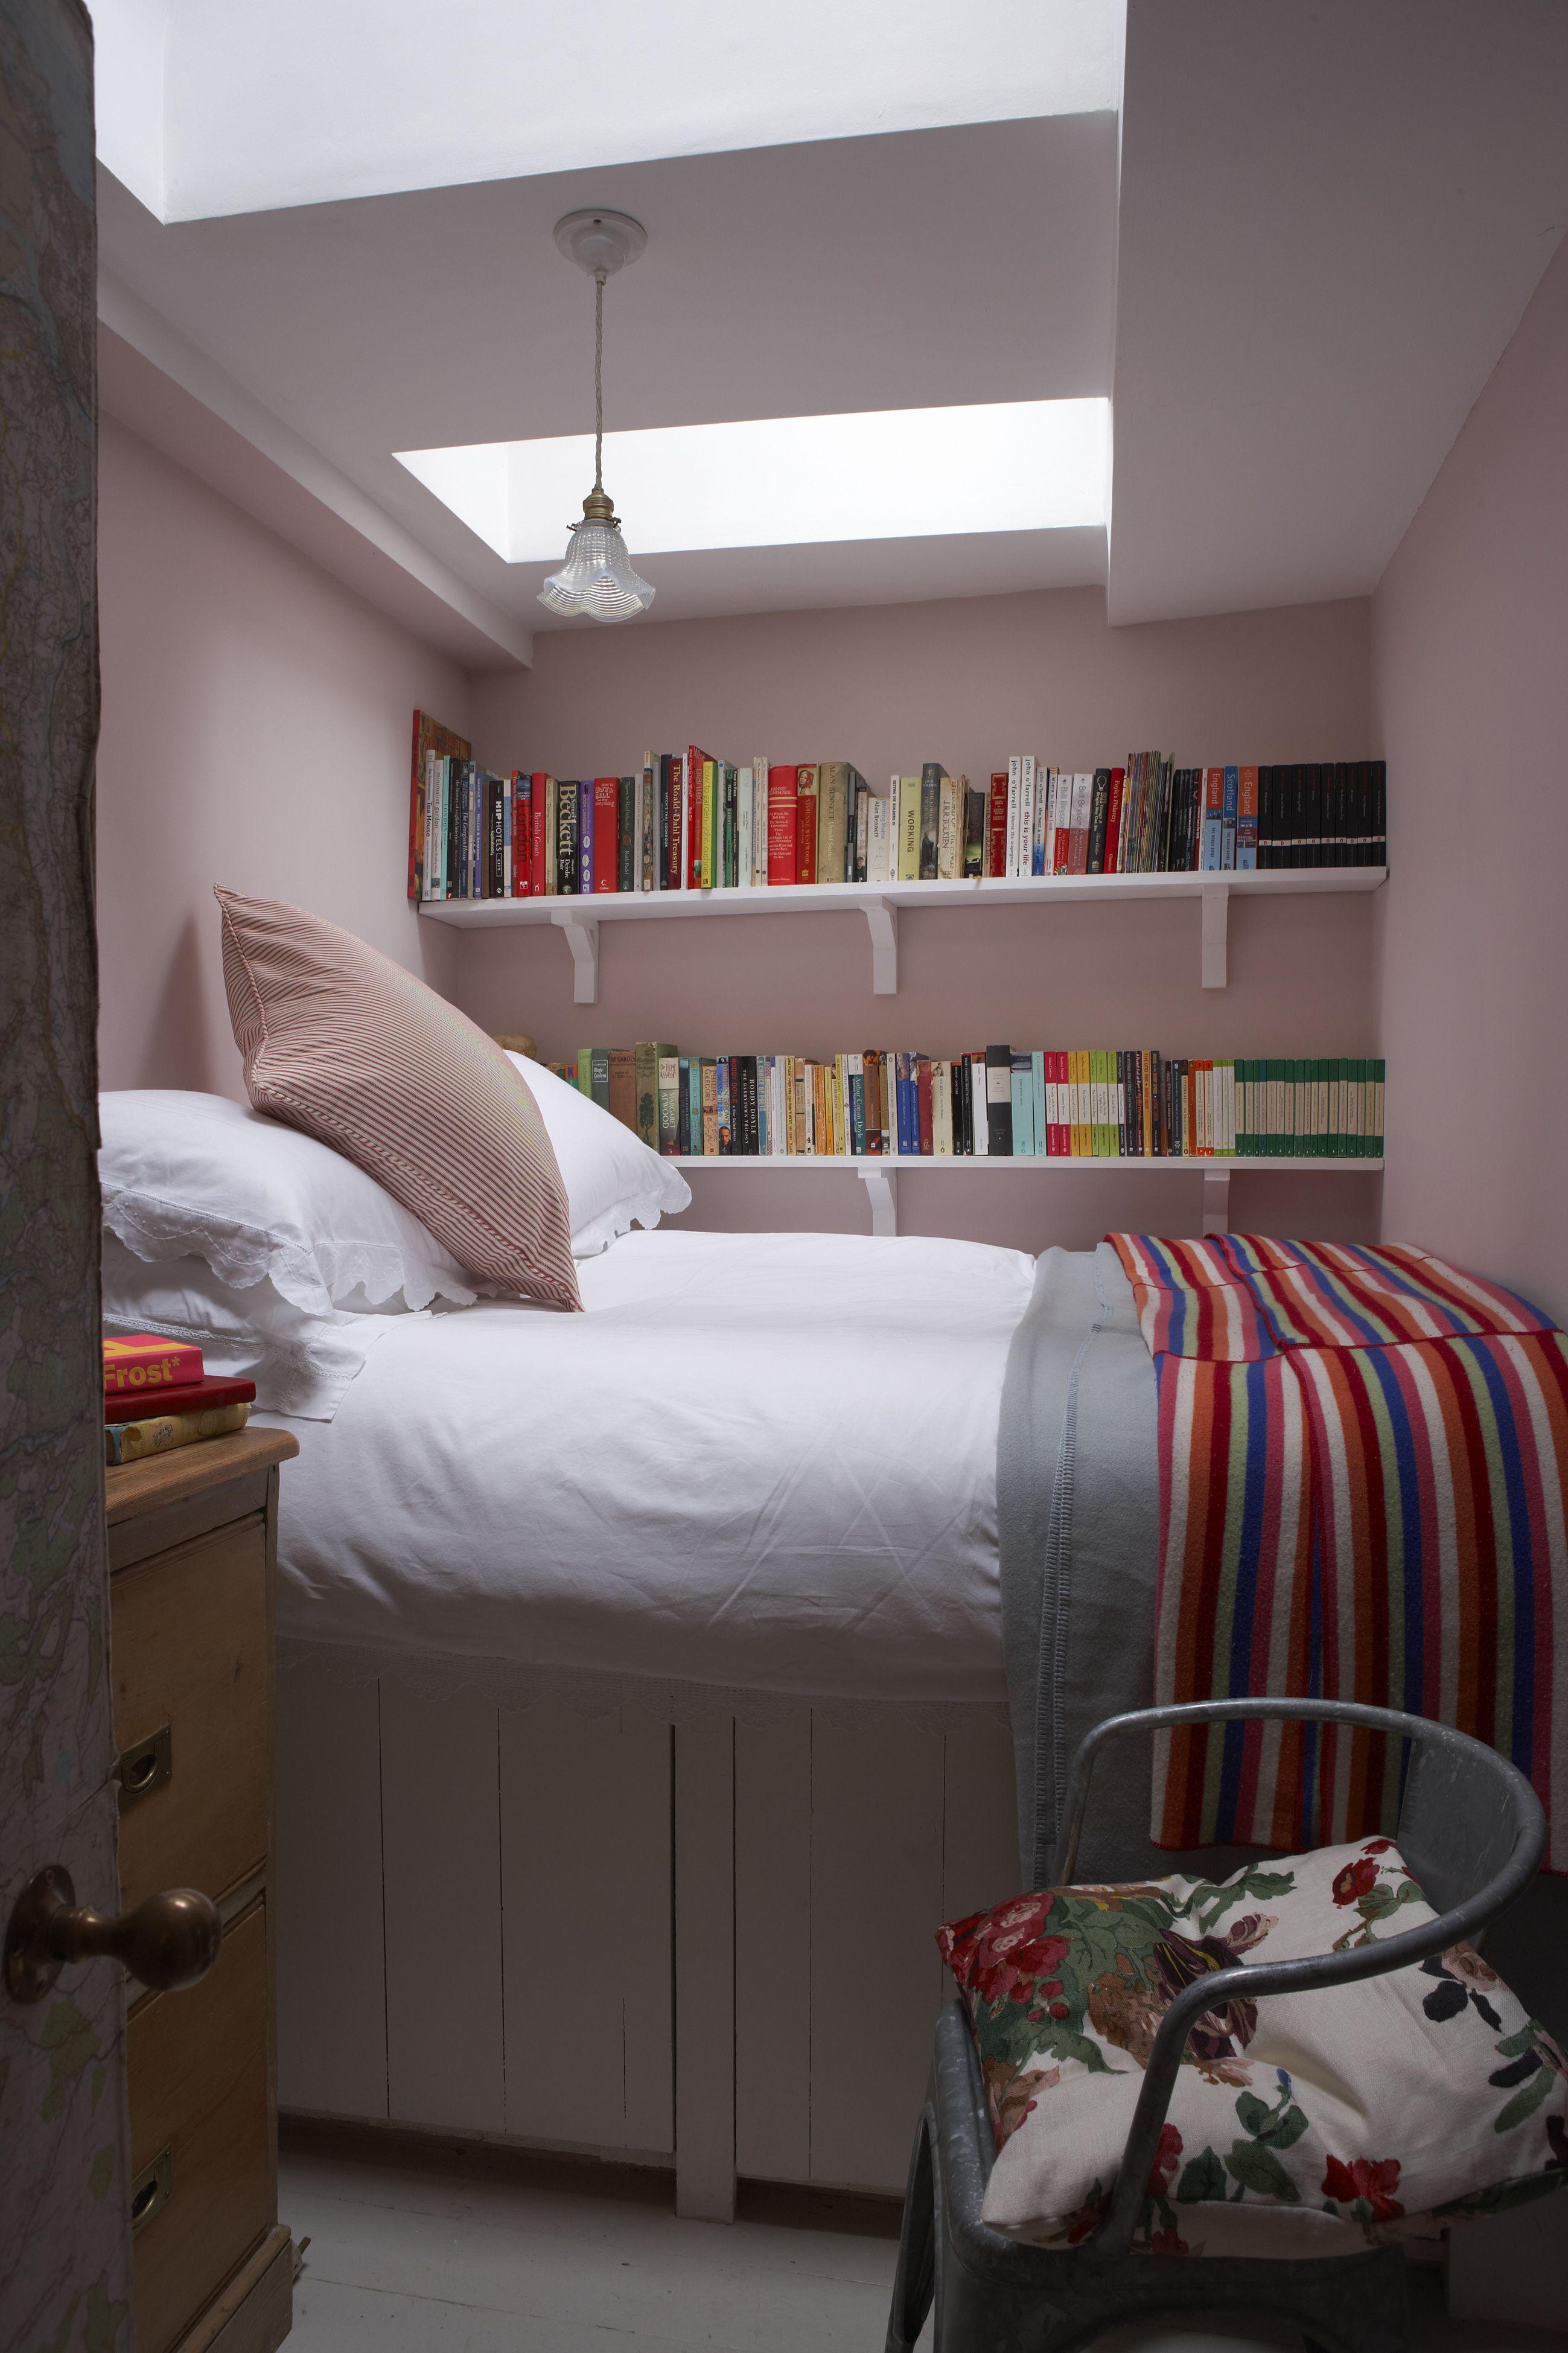 Bedroom Small Bedroom Decor Small Room Design Small Room Bedroom